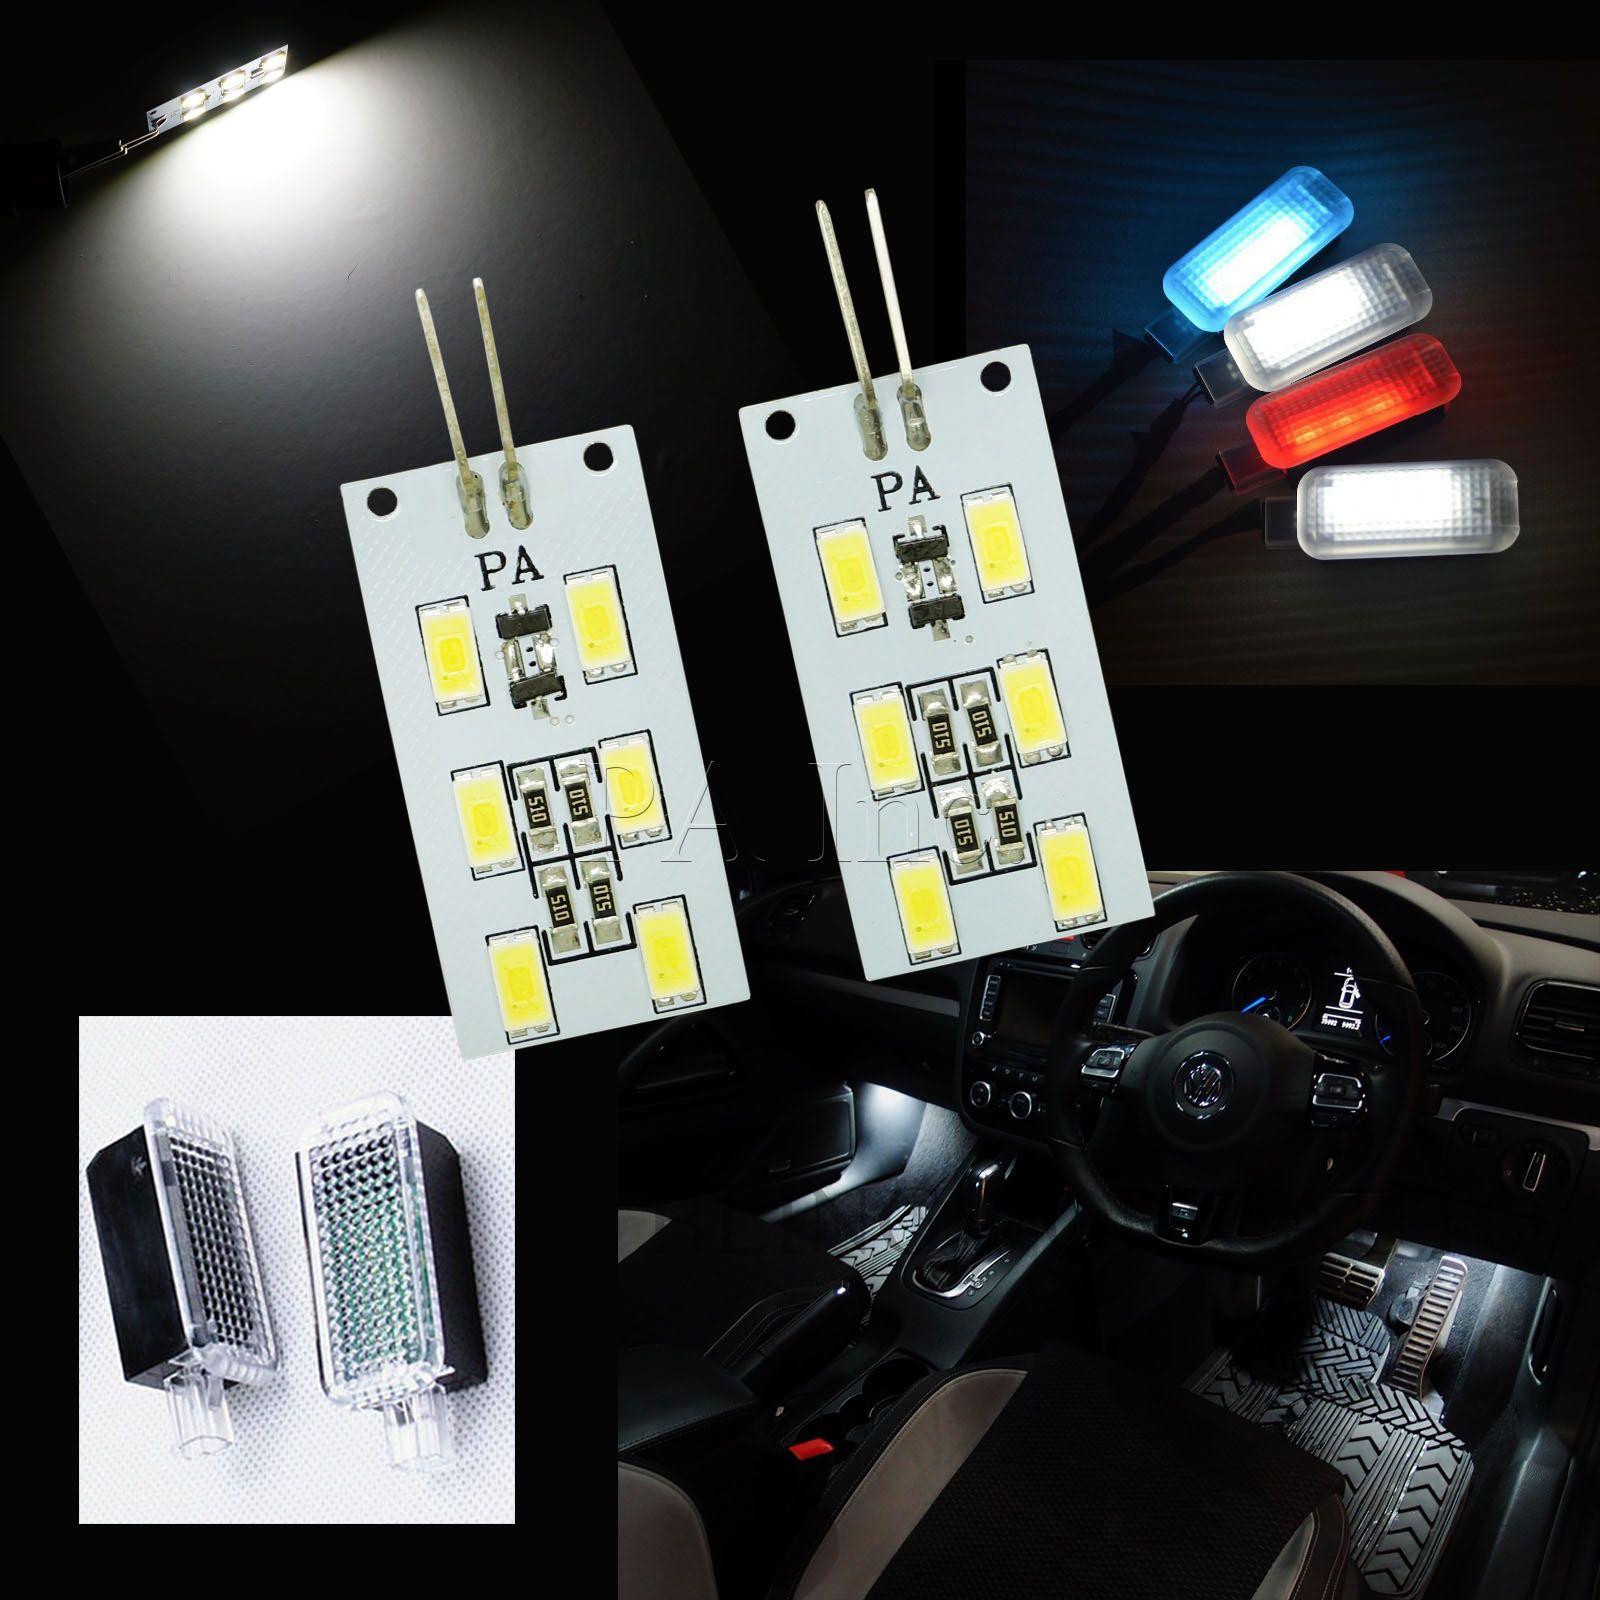 2016 New Product Auto Car Reading Interior Lamp for VW Audi Glove Light Foot Light G4 6SMD 5630  #readinglight #gloveboxlight #autocarbulbs #gootlight #5630led #6SMDwhite